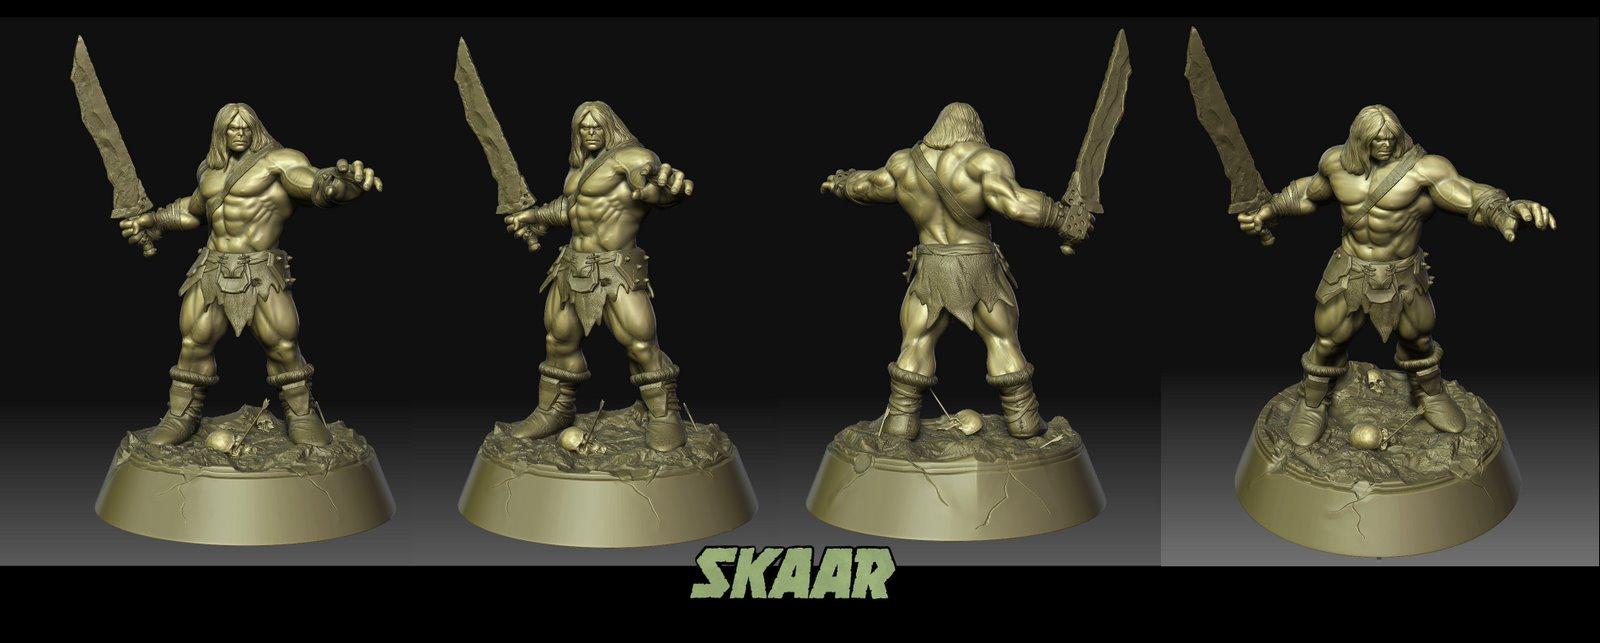 Les travaux de AY sculpture - Page 4 Skaar